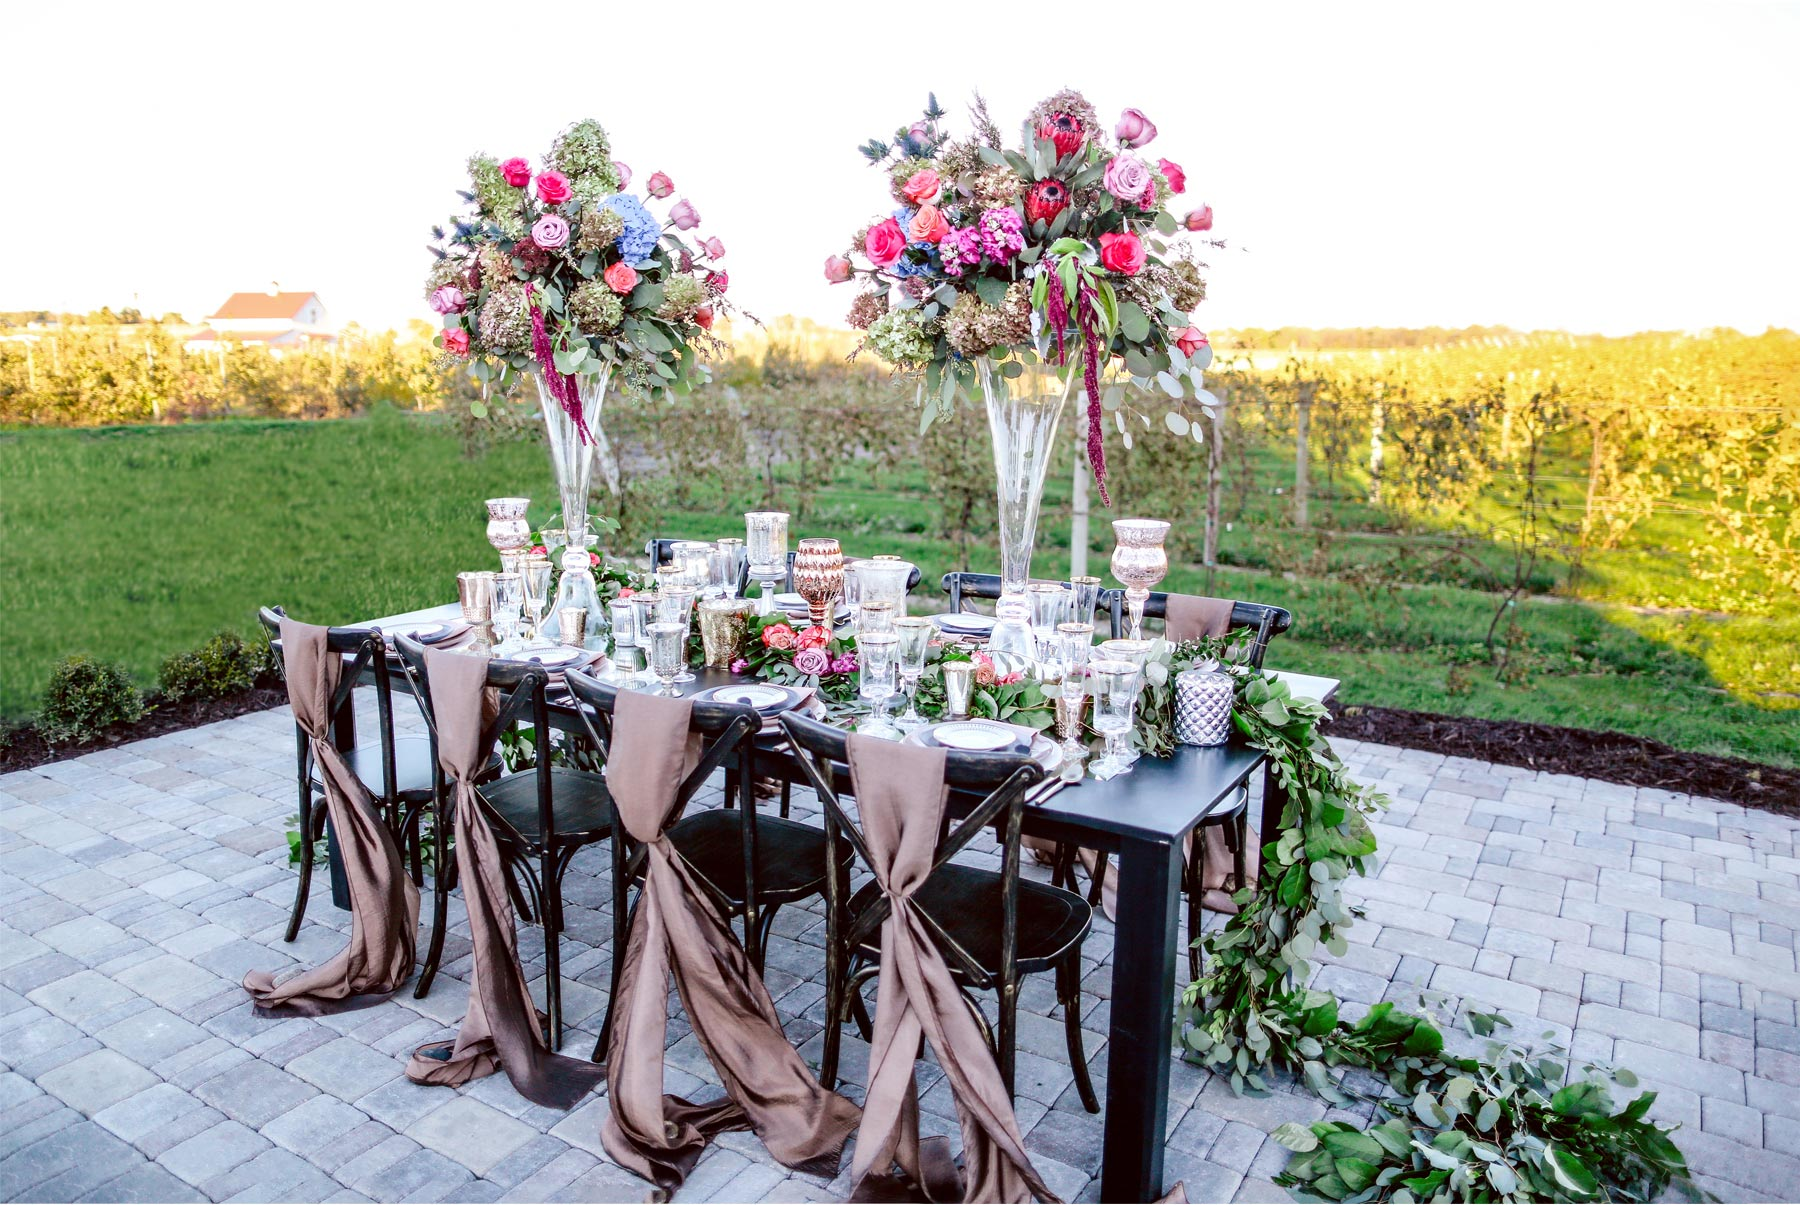 11-Ashery-Lane-Farm-Minneapolis-Minnesota-Wedding-Styled-Shoot-New-Venue-Barn-Orchard-Vineyard-Dinner-Place-Setting-Decor.jpg